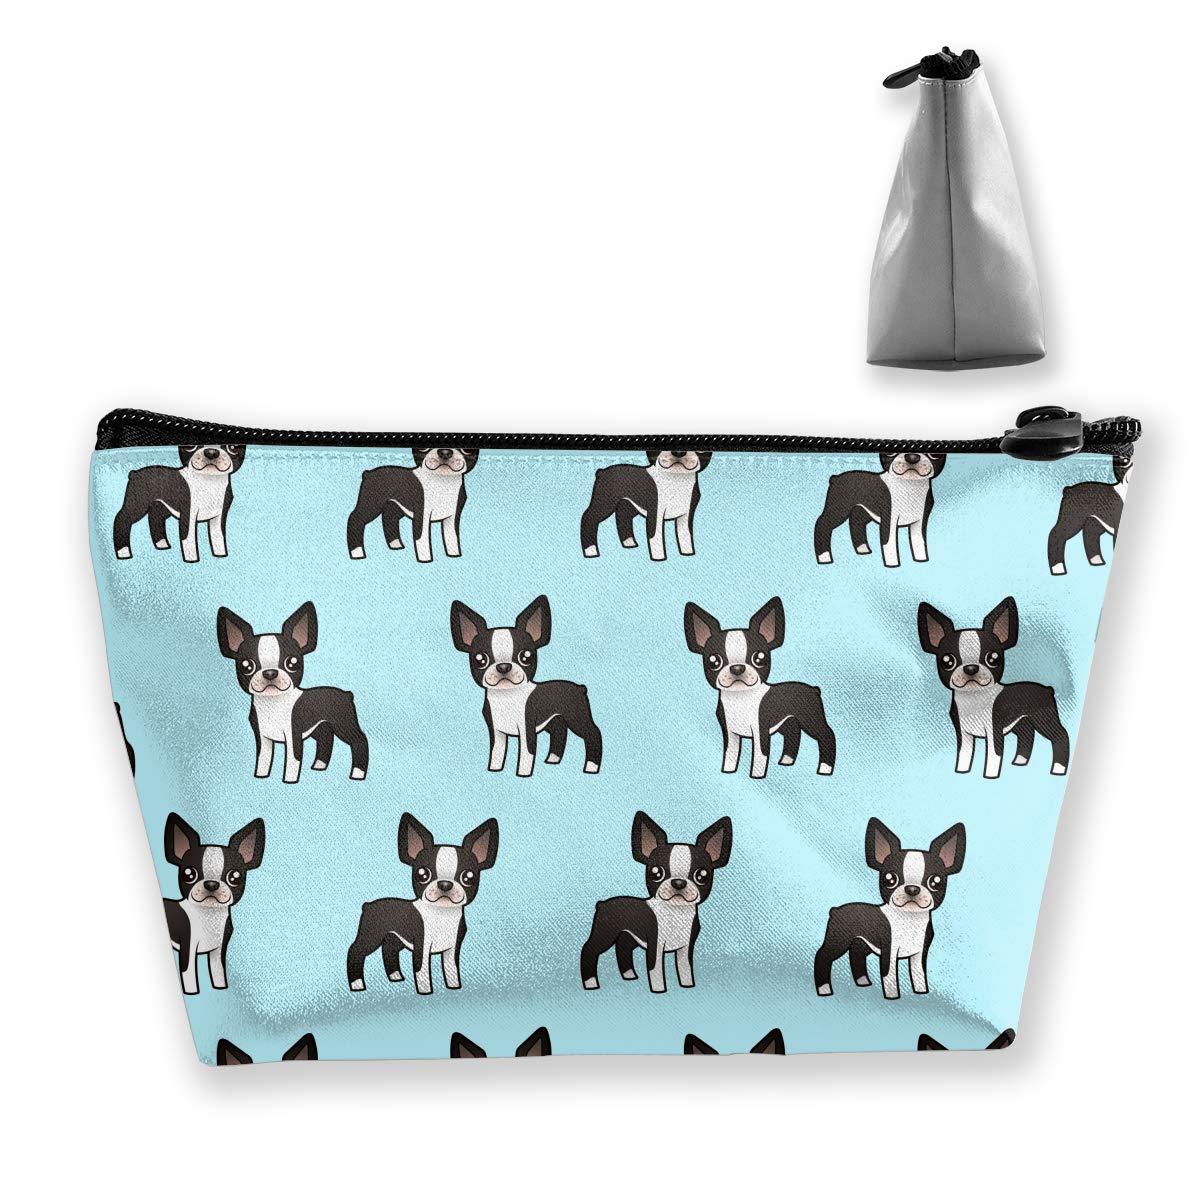 Lightweight Multi-Purpose Zipper Trapezoidal Storage Bag Organizer Pouch Small Cosmetic Makeup Bag Coin Cellphone Purse Pencil Pouch (Cute Boston Terrier)